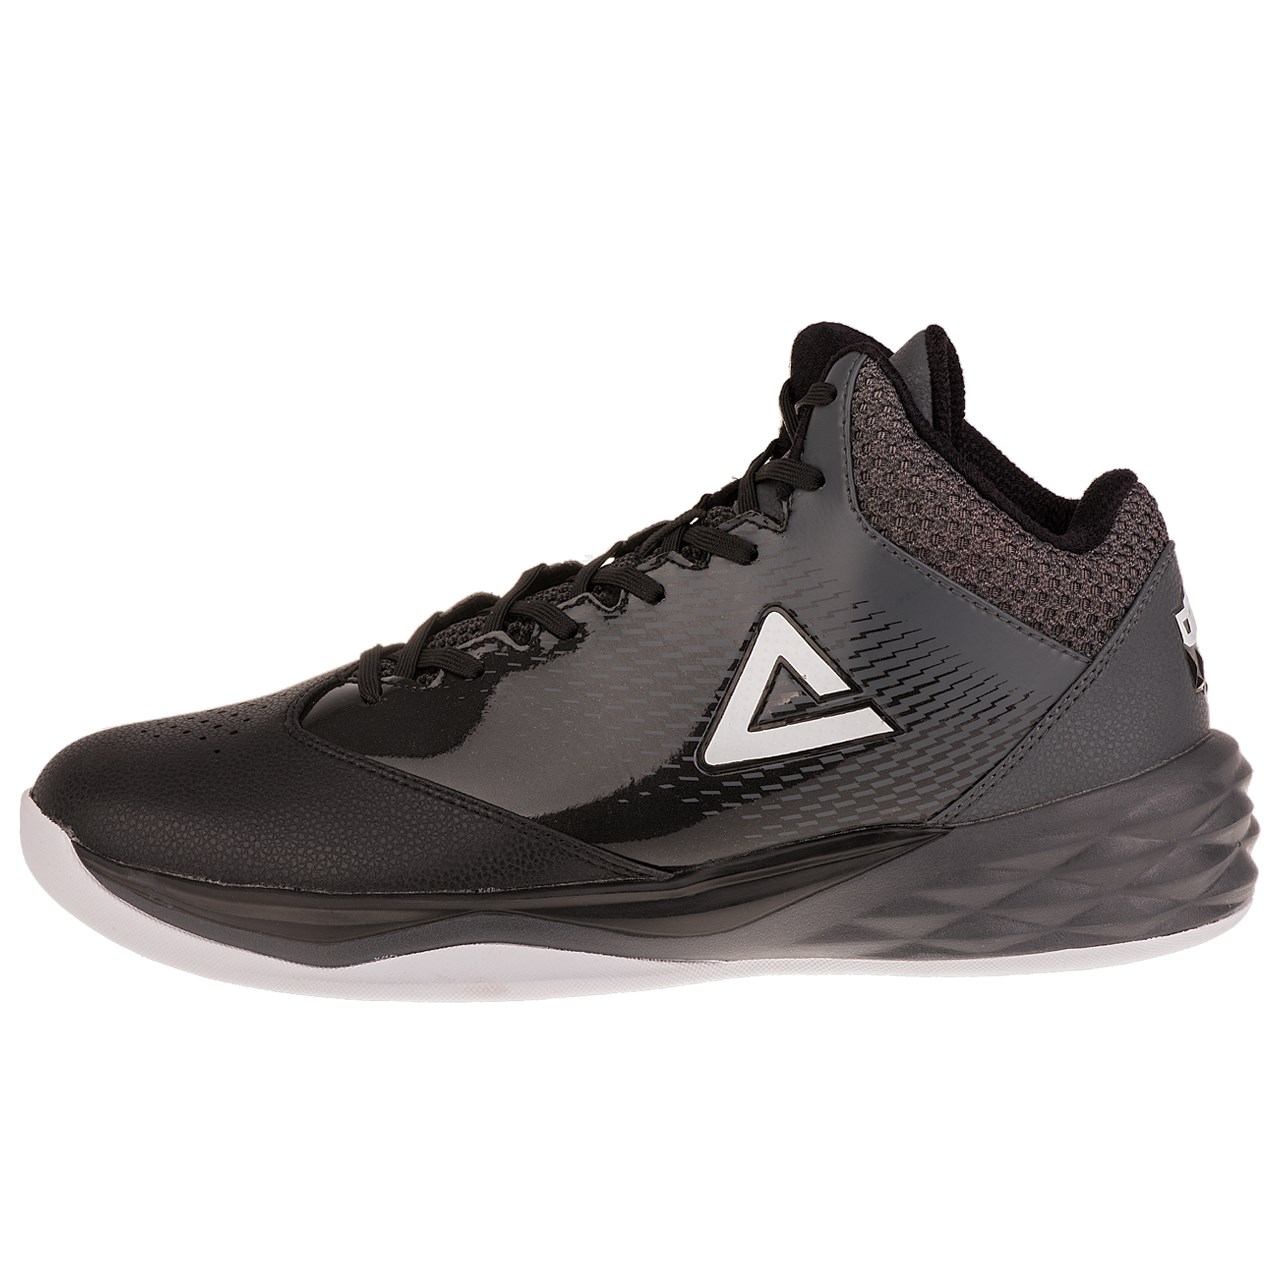 قیمت کفش بسکتبال مردانه پیک مدل1 E73071A